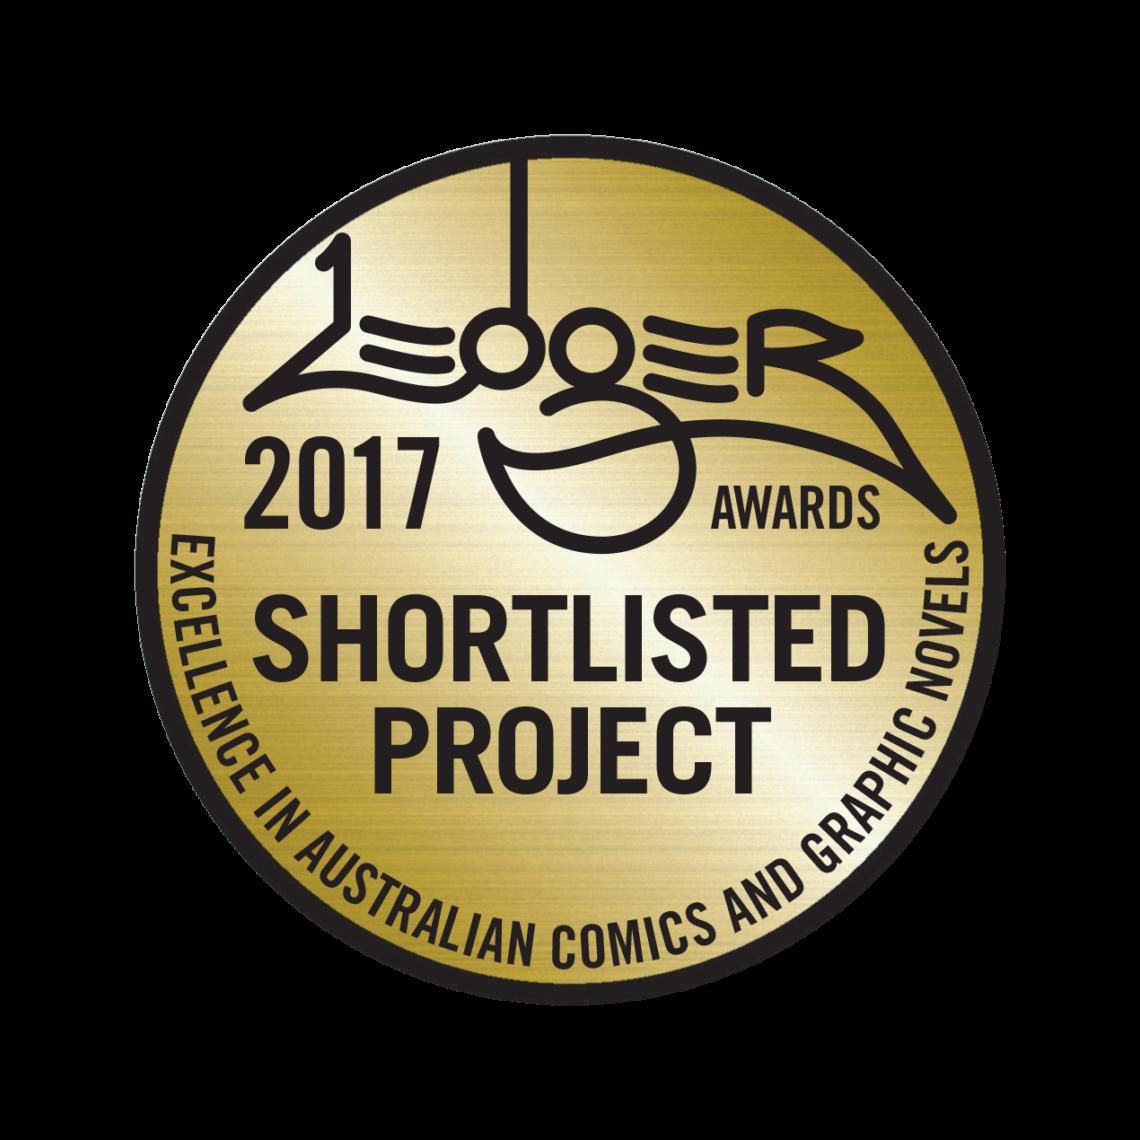 Ledger Awards shortlist